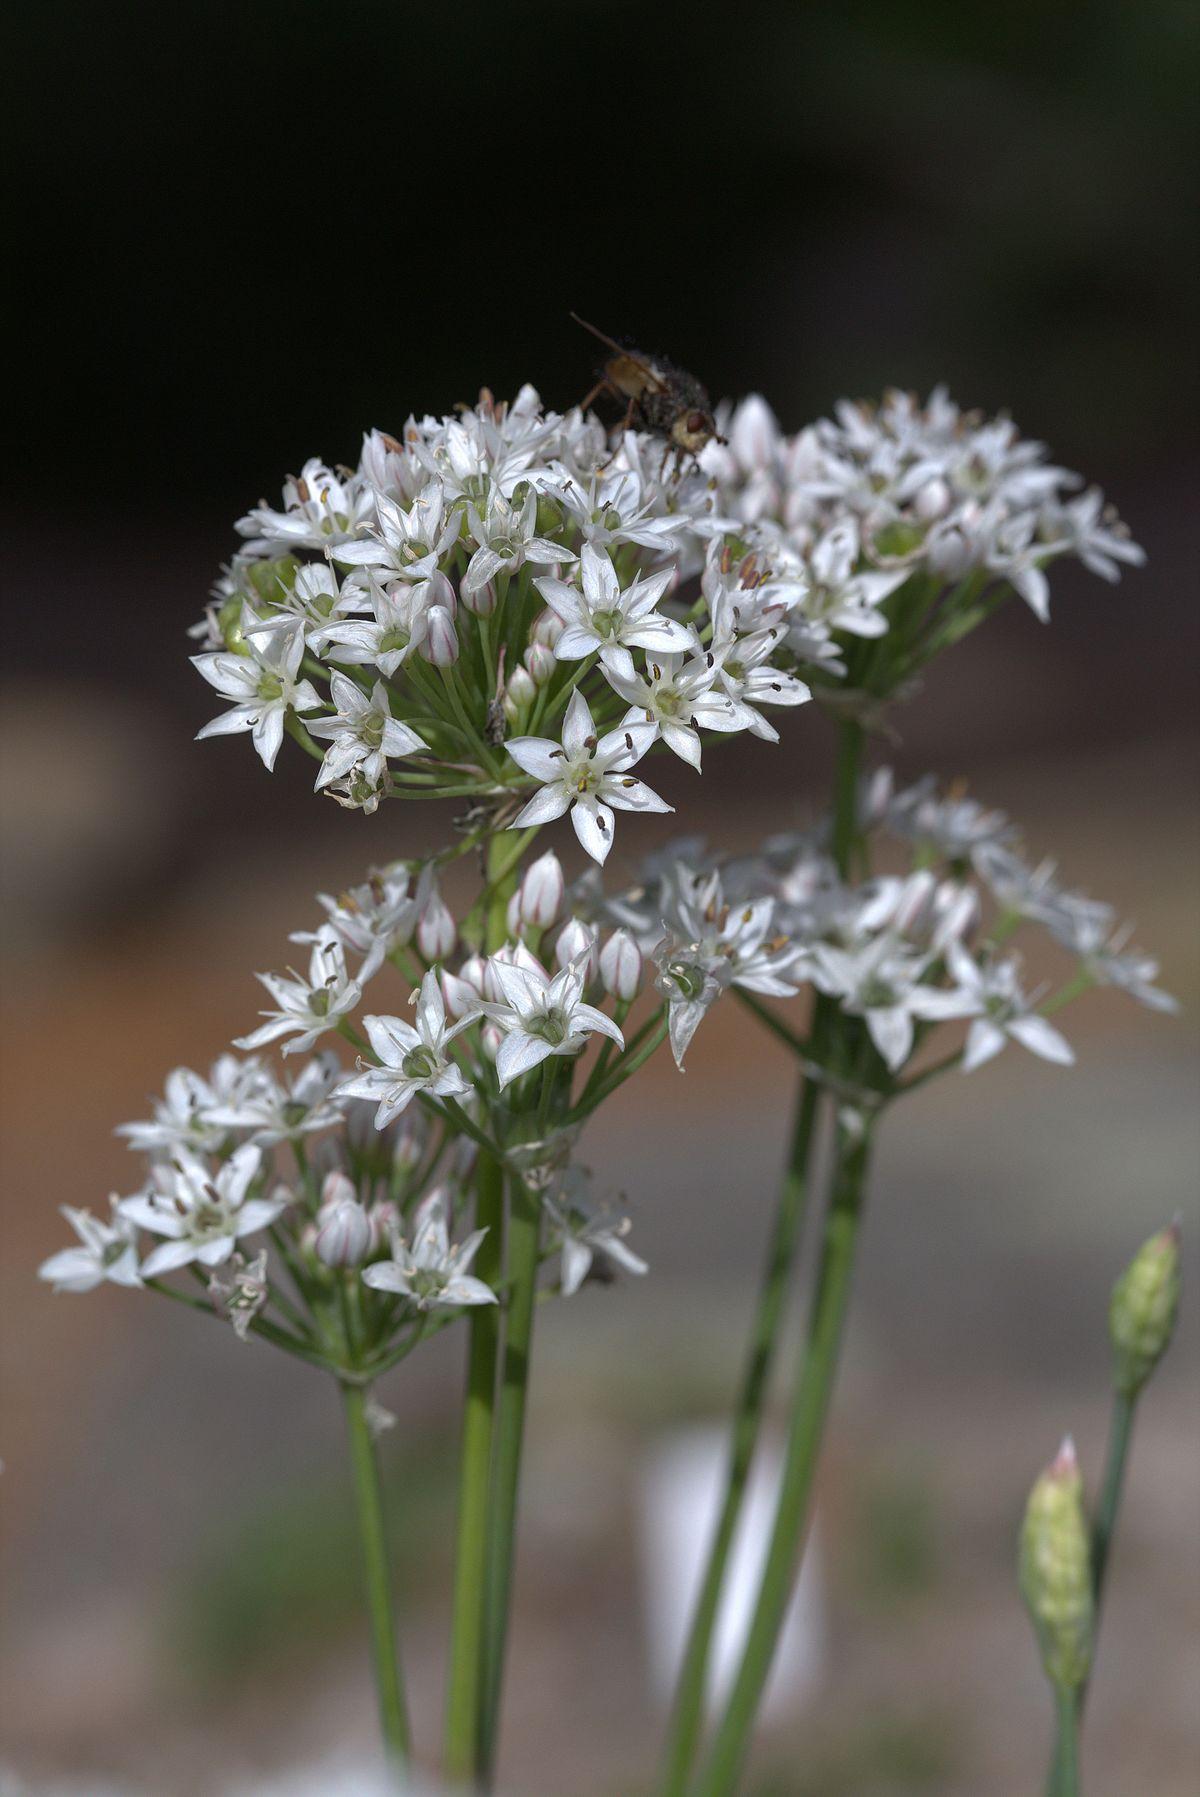 Allium Barsczewskii Wikipedia